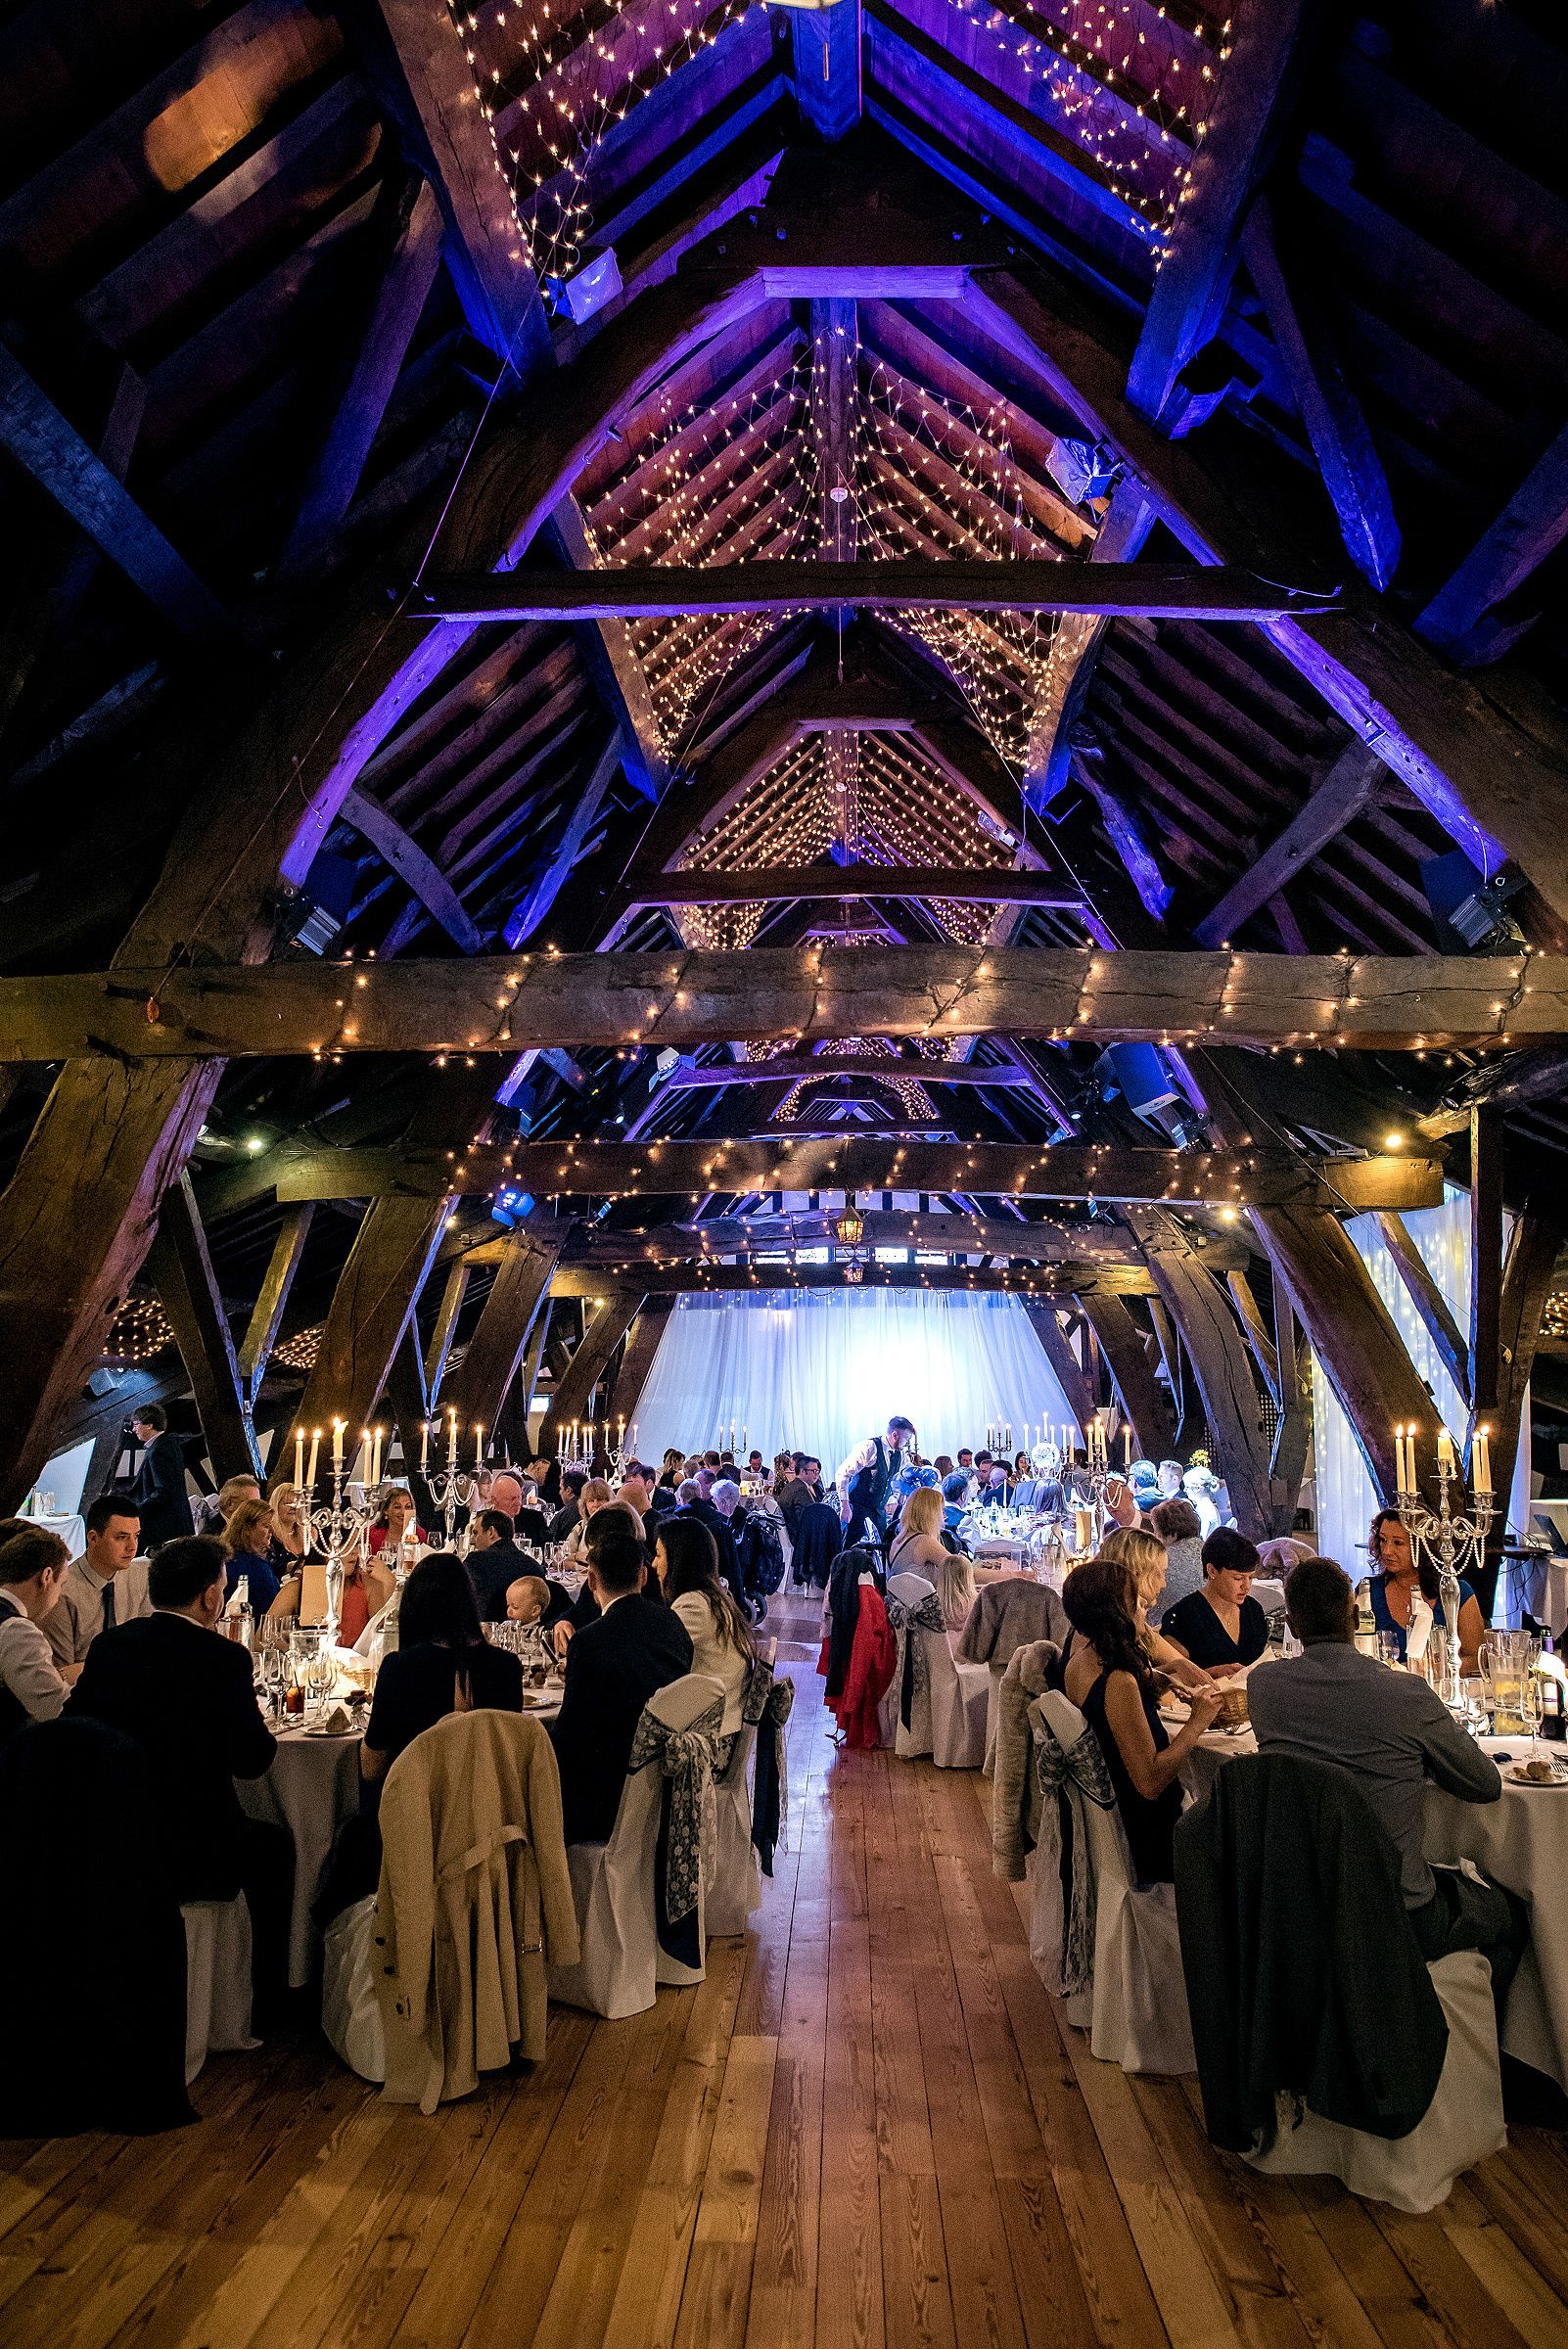 Wedding At Rivington Hall Barn Photographed By Derbyshire Based Destination Photographer Shaun Taylor